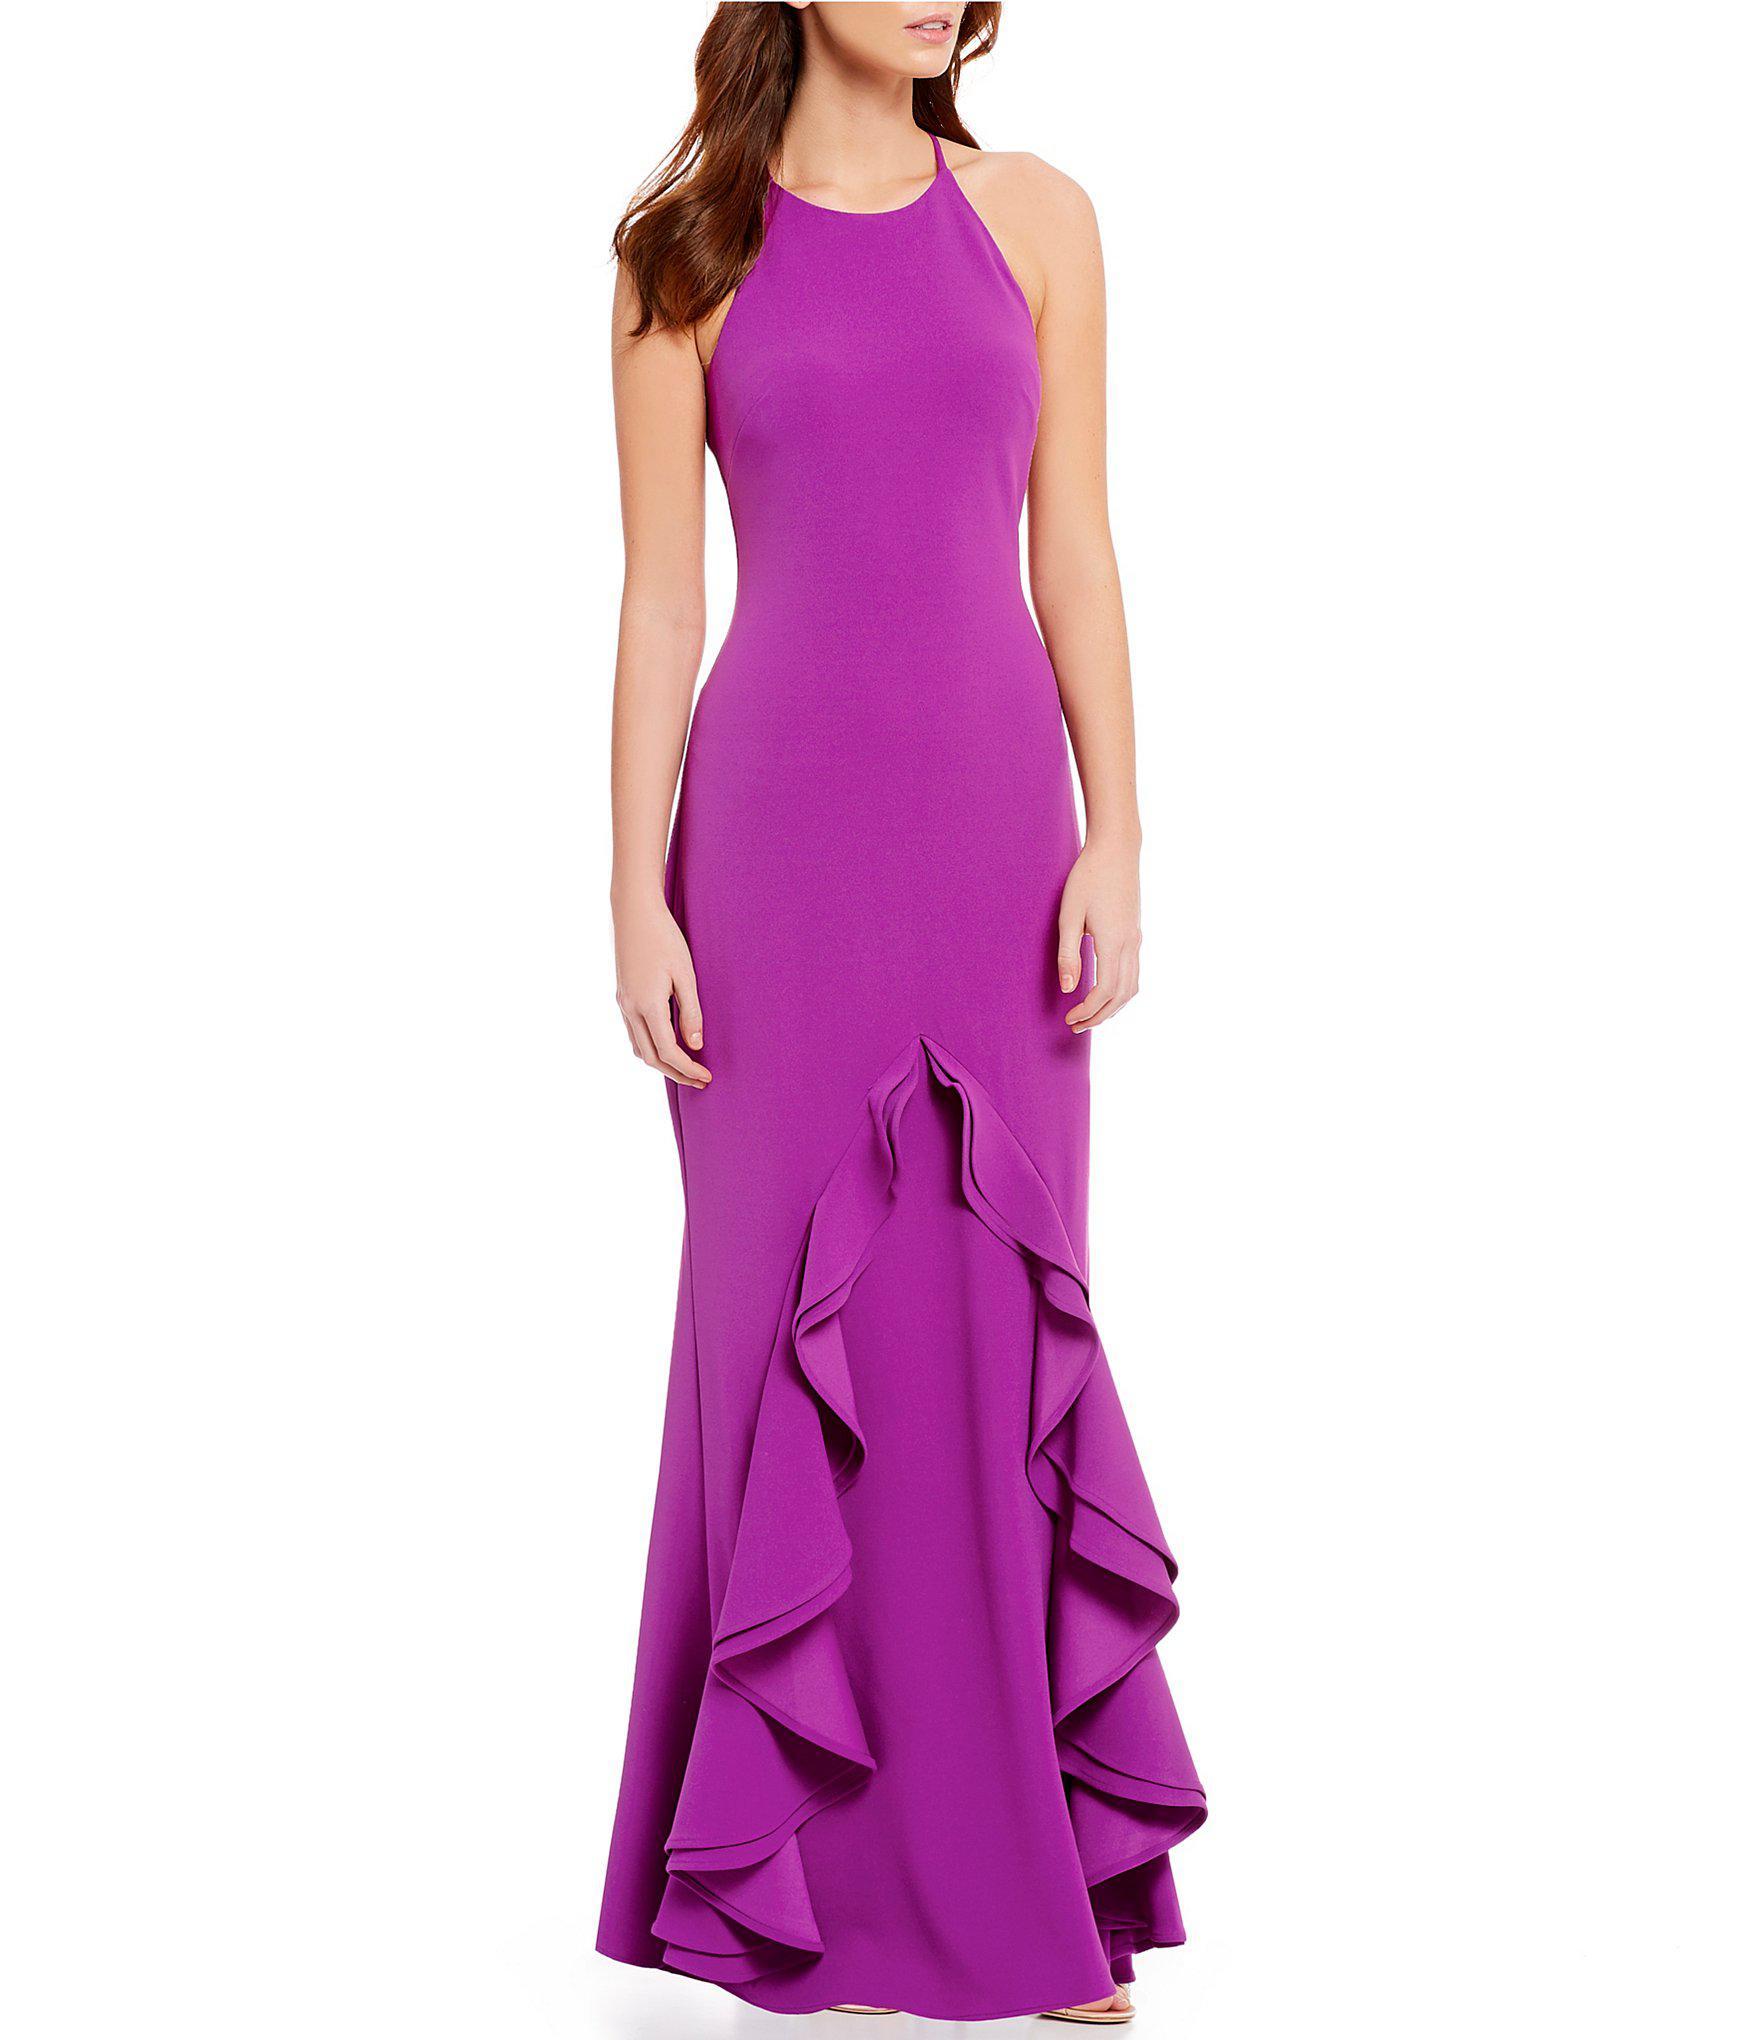 a9c64a31b2b Belle By Badgley Mischka Crew Neck Ruffle Gown in Purple - Lyst